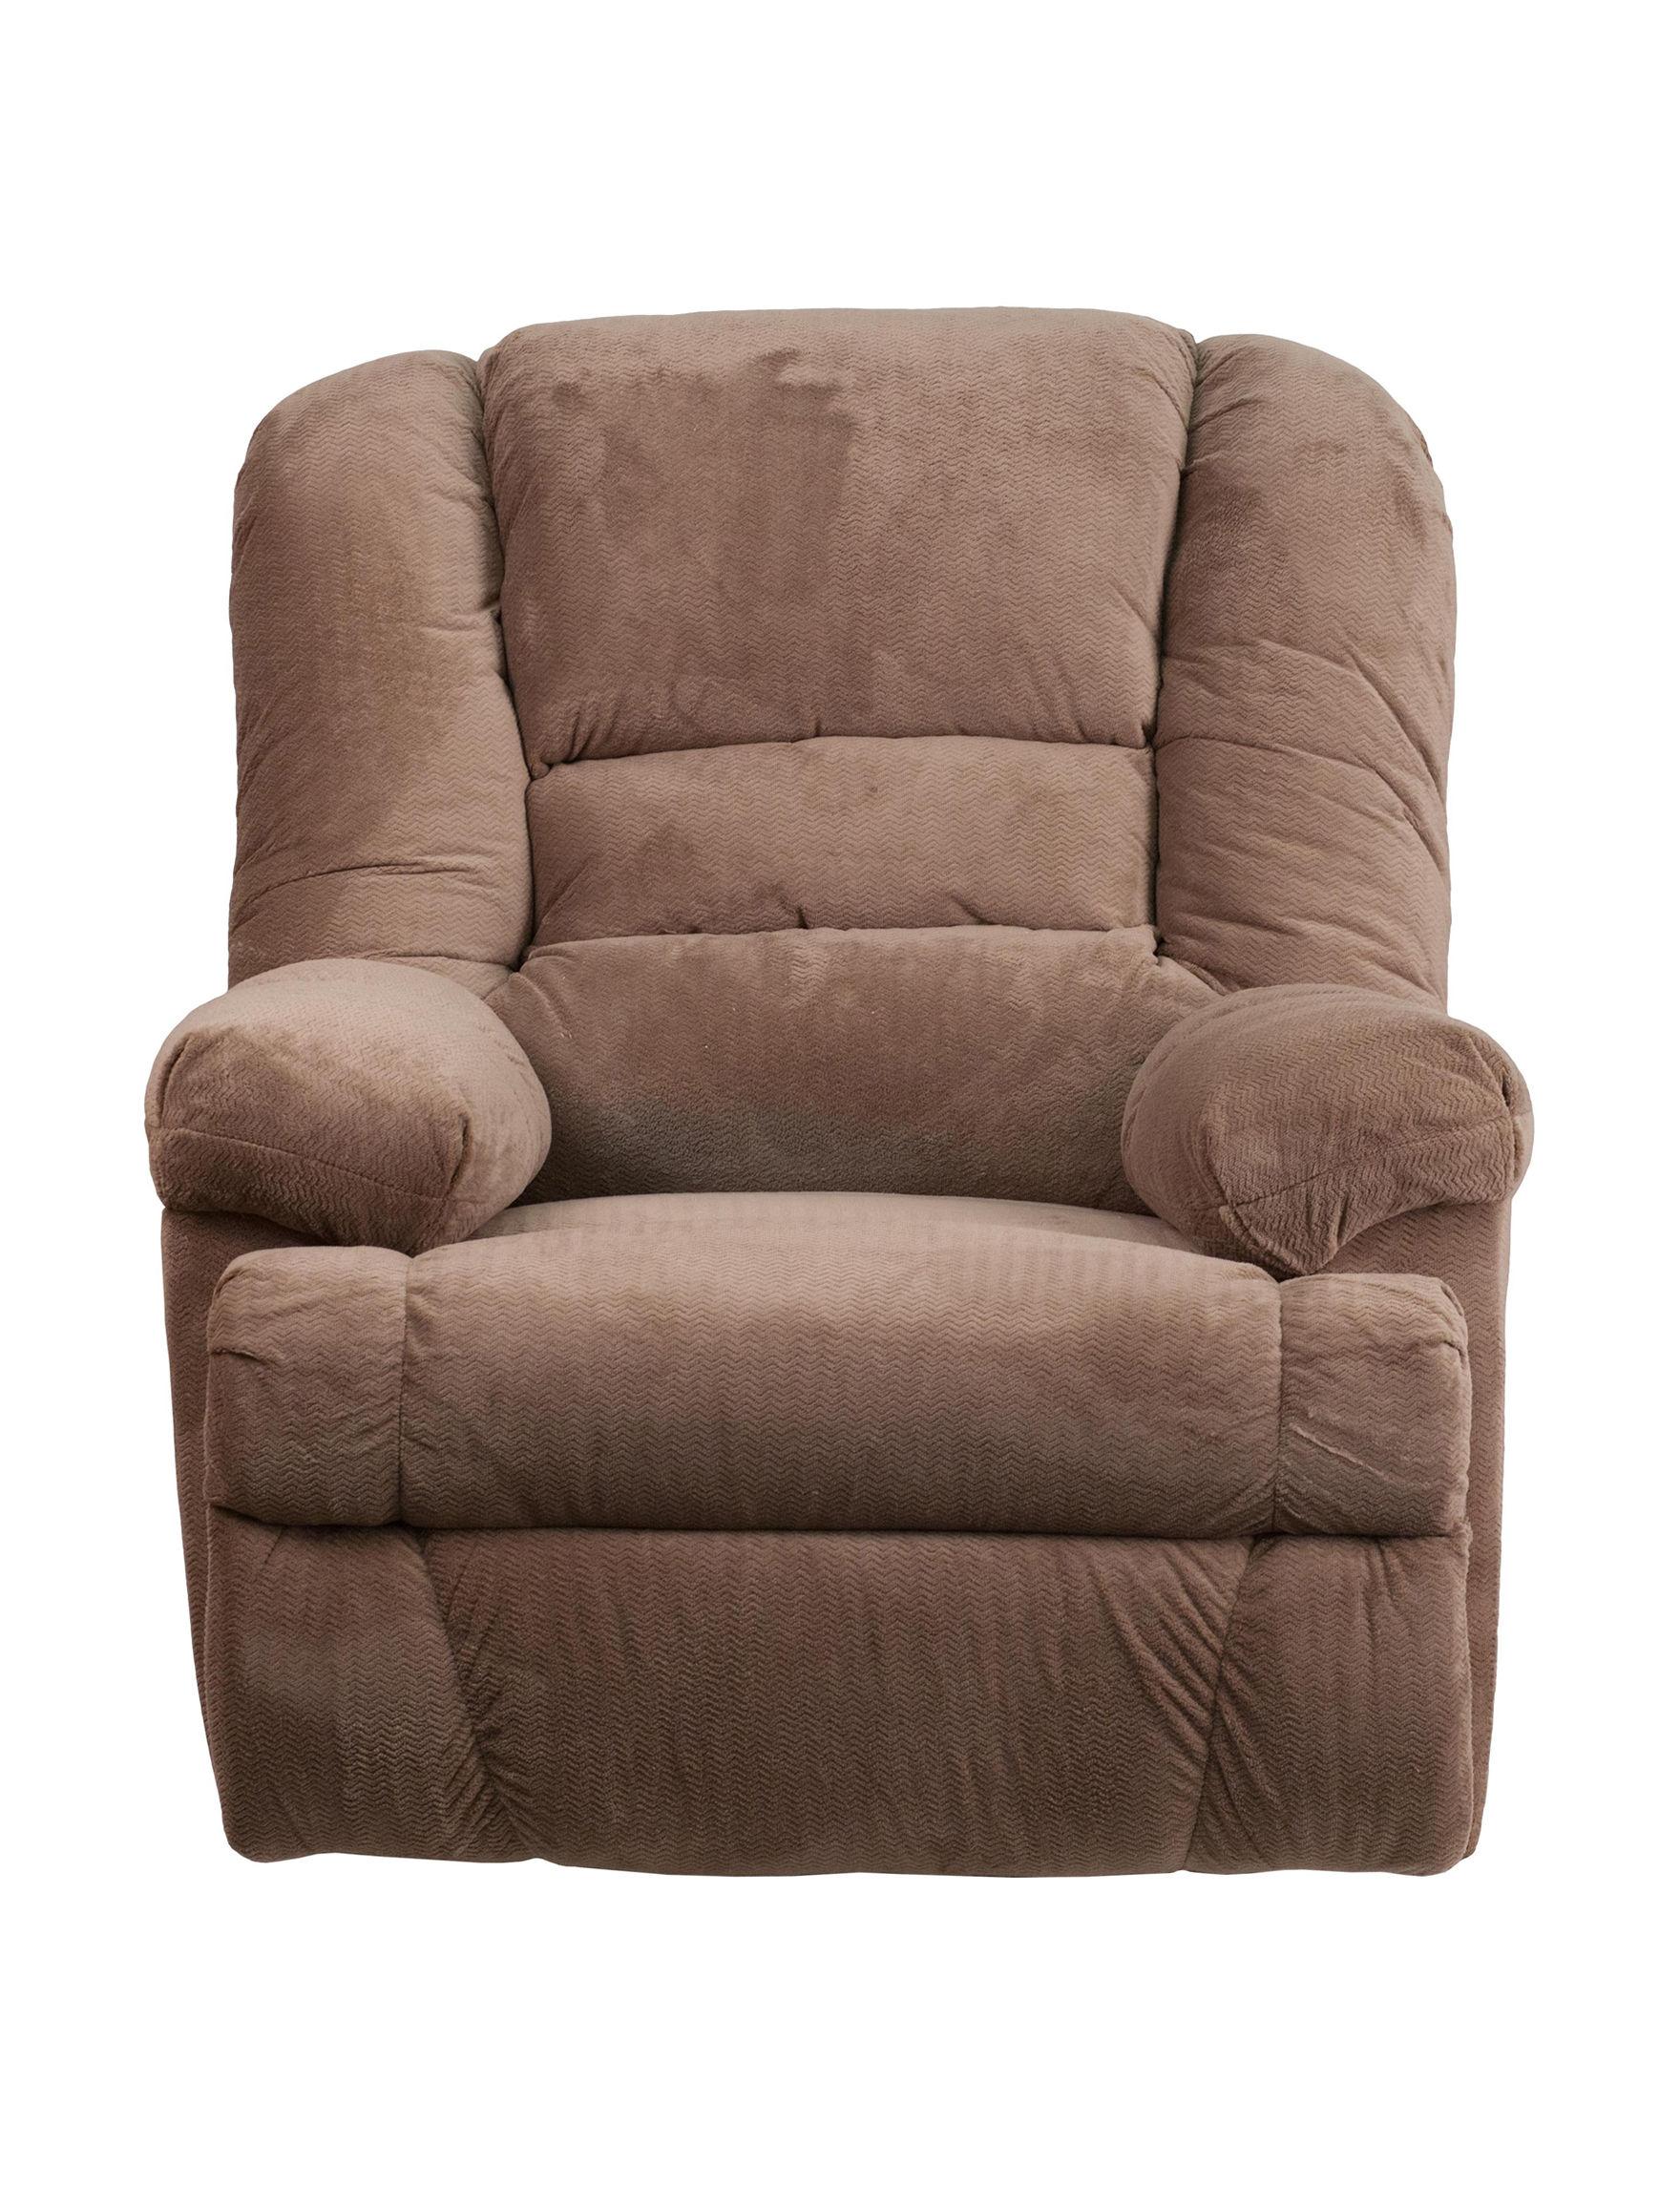 Flash Furniture Tan Living Room Furniture